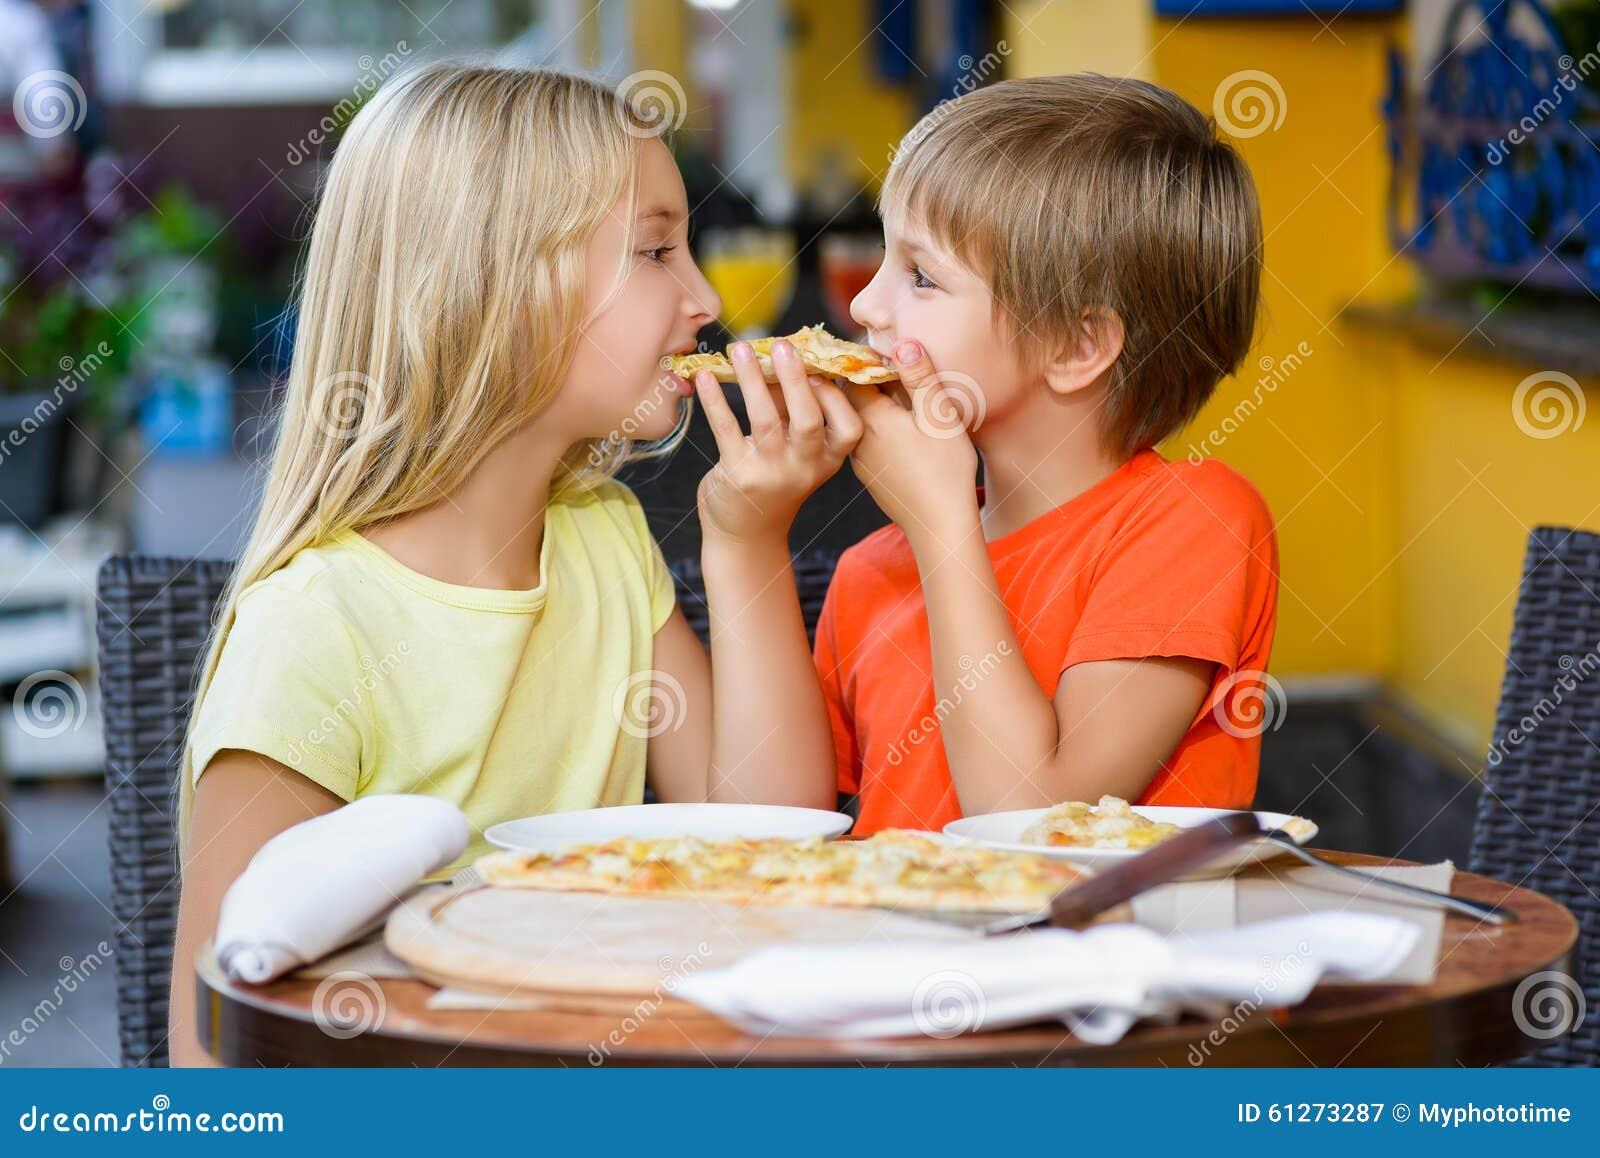 Happy Children Indoors Eating Pizza Smiling Stock Photo